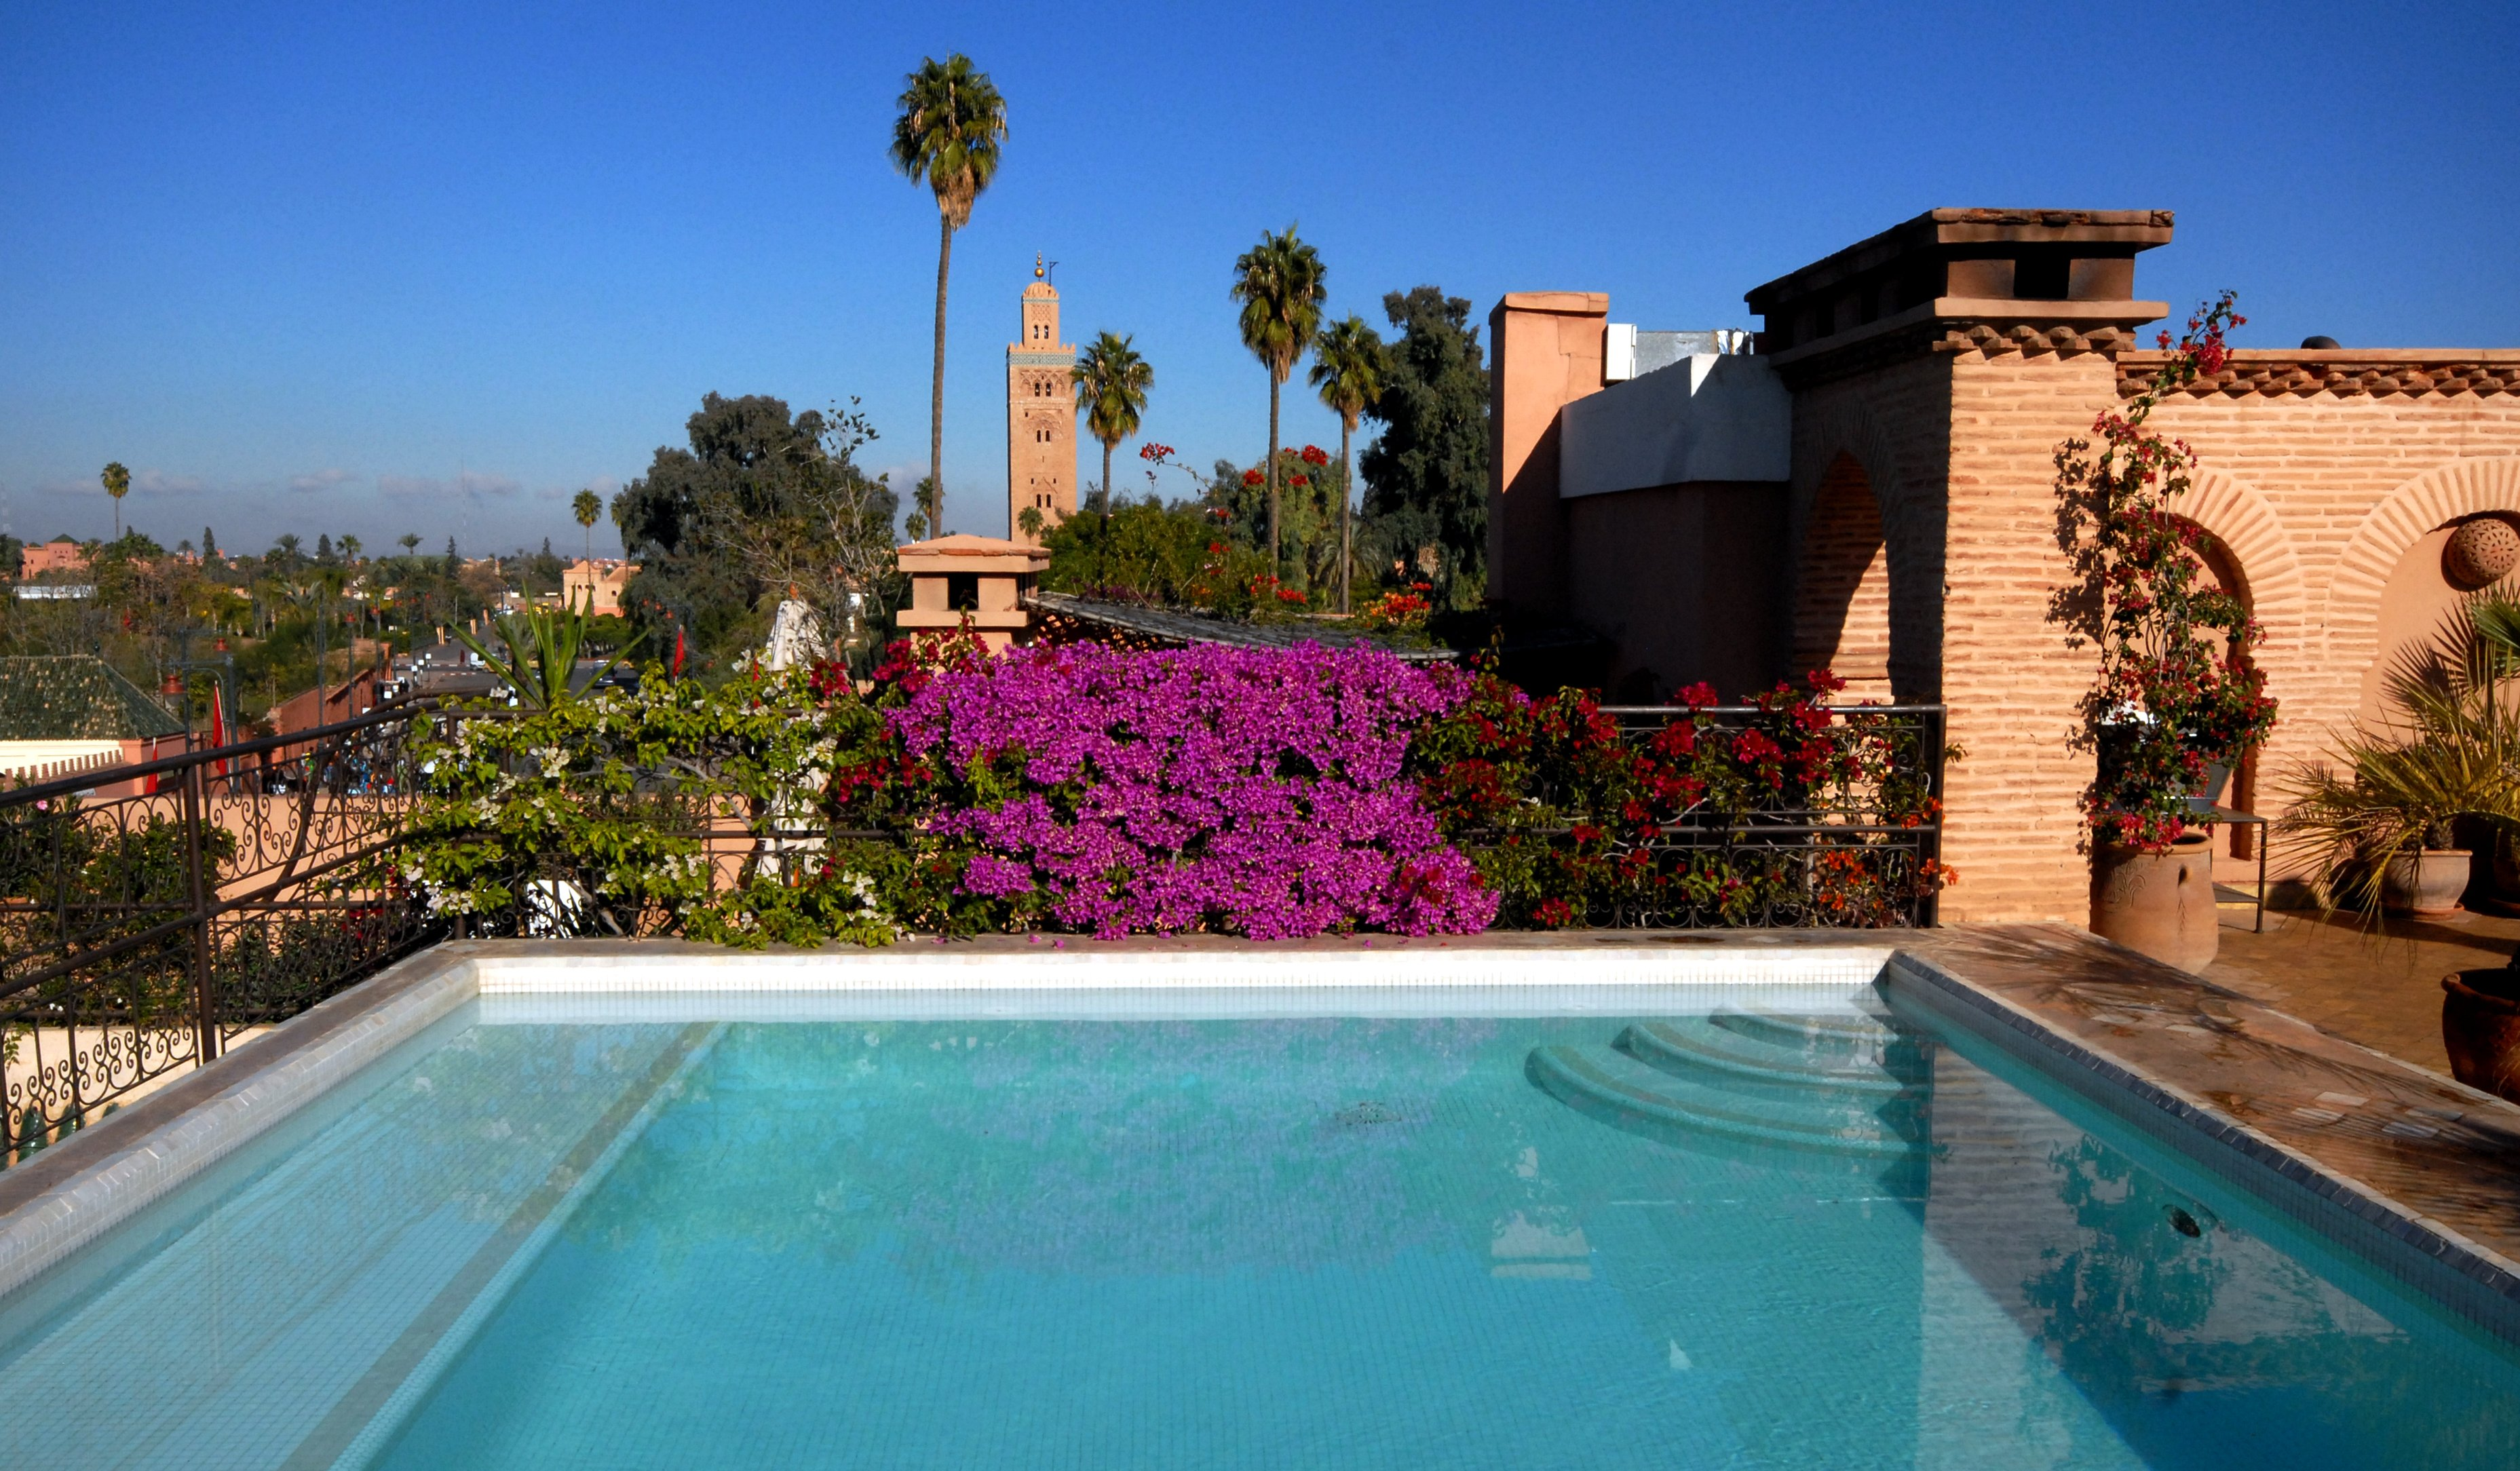 Rooftop-pool-villa-des-orangers